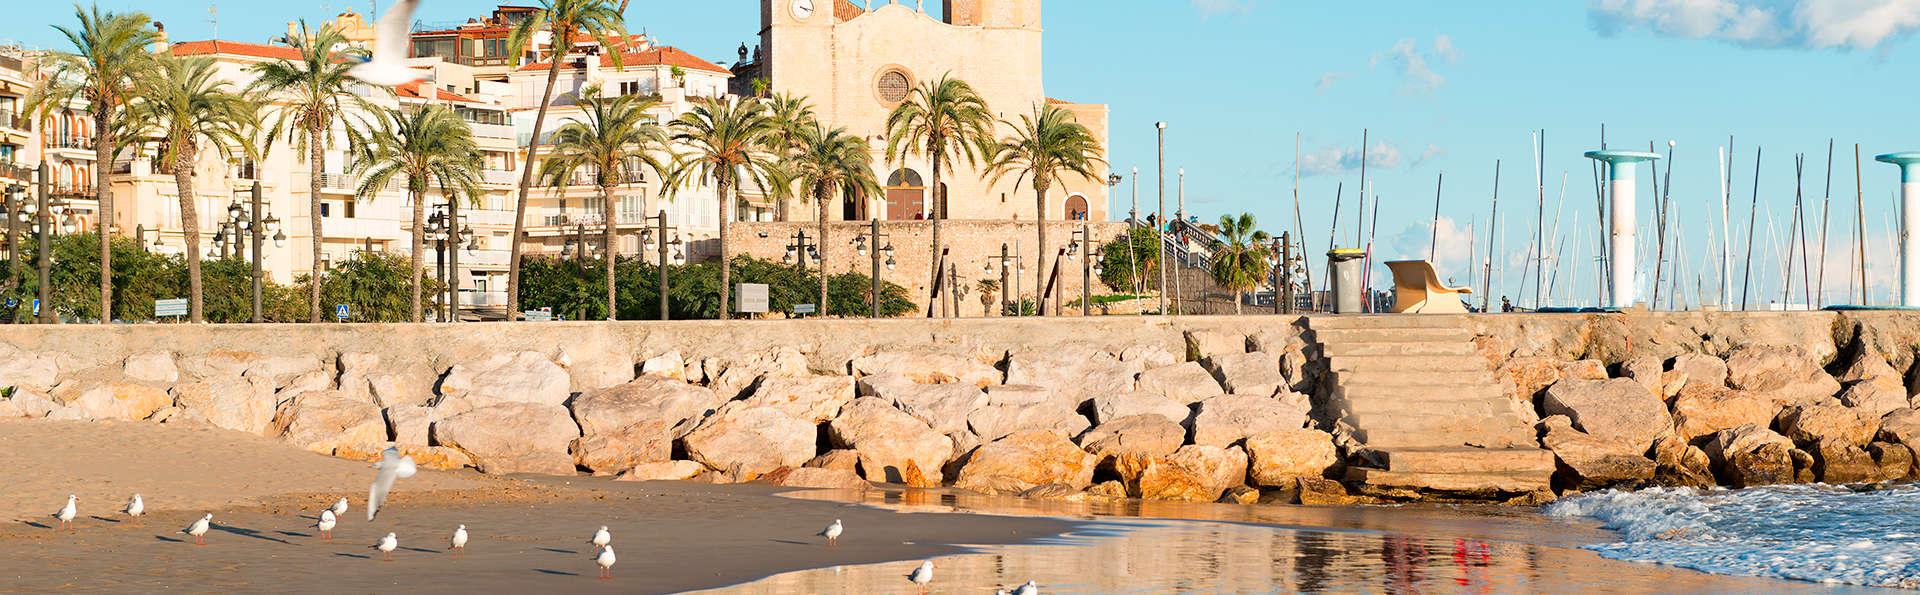 URH Sitges Playa - EDIT_destination.jpg